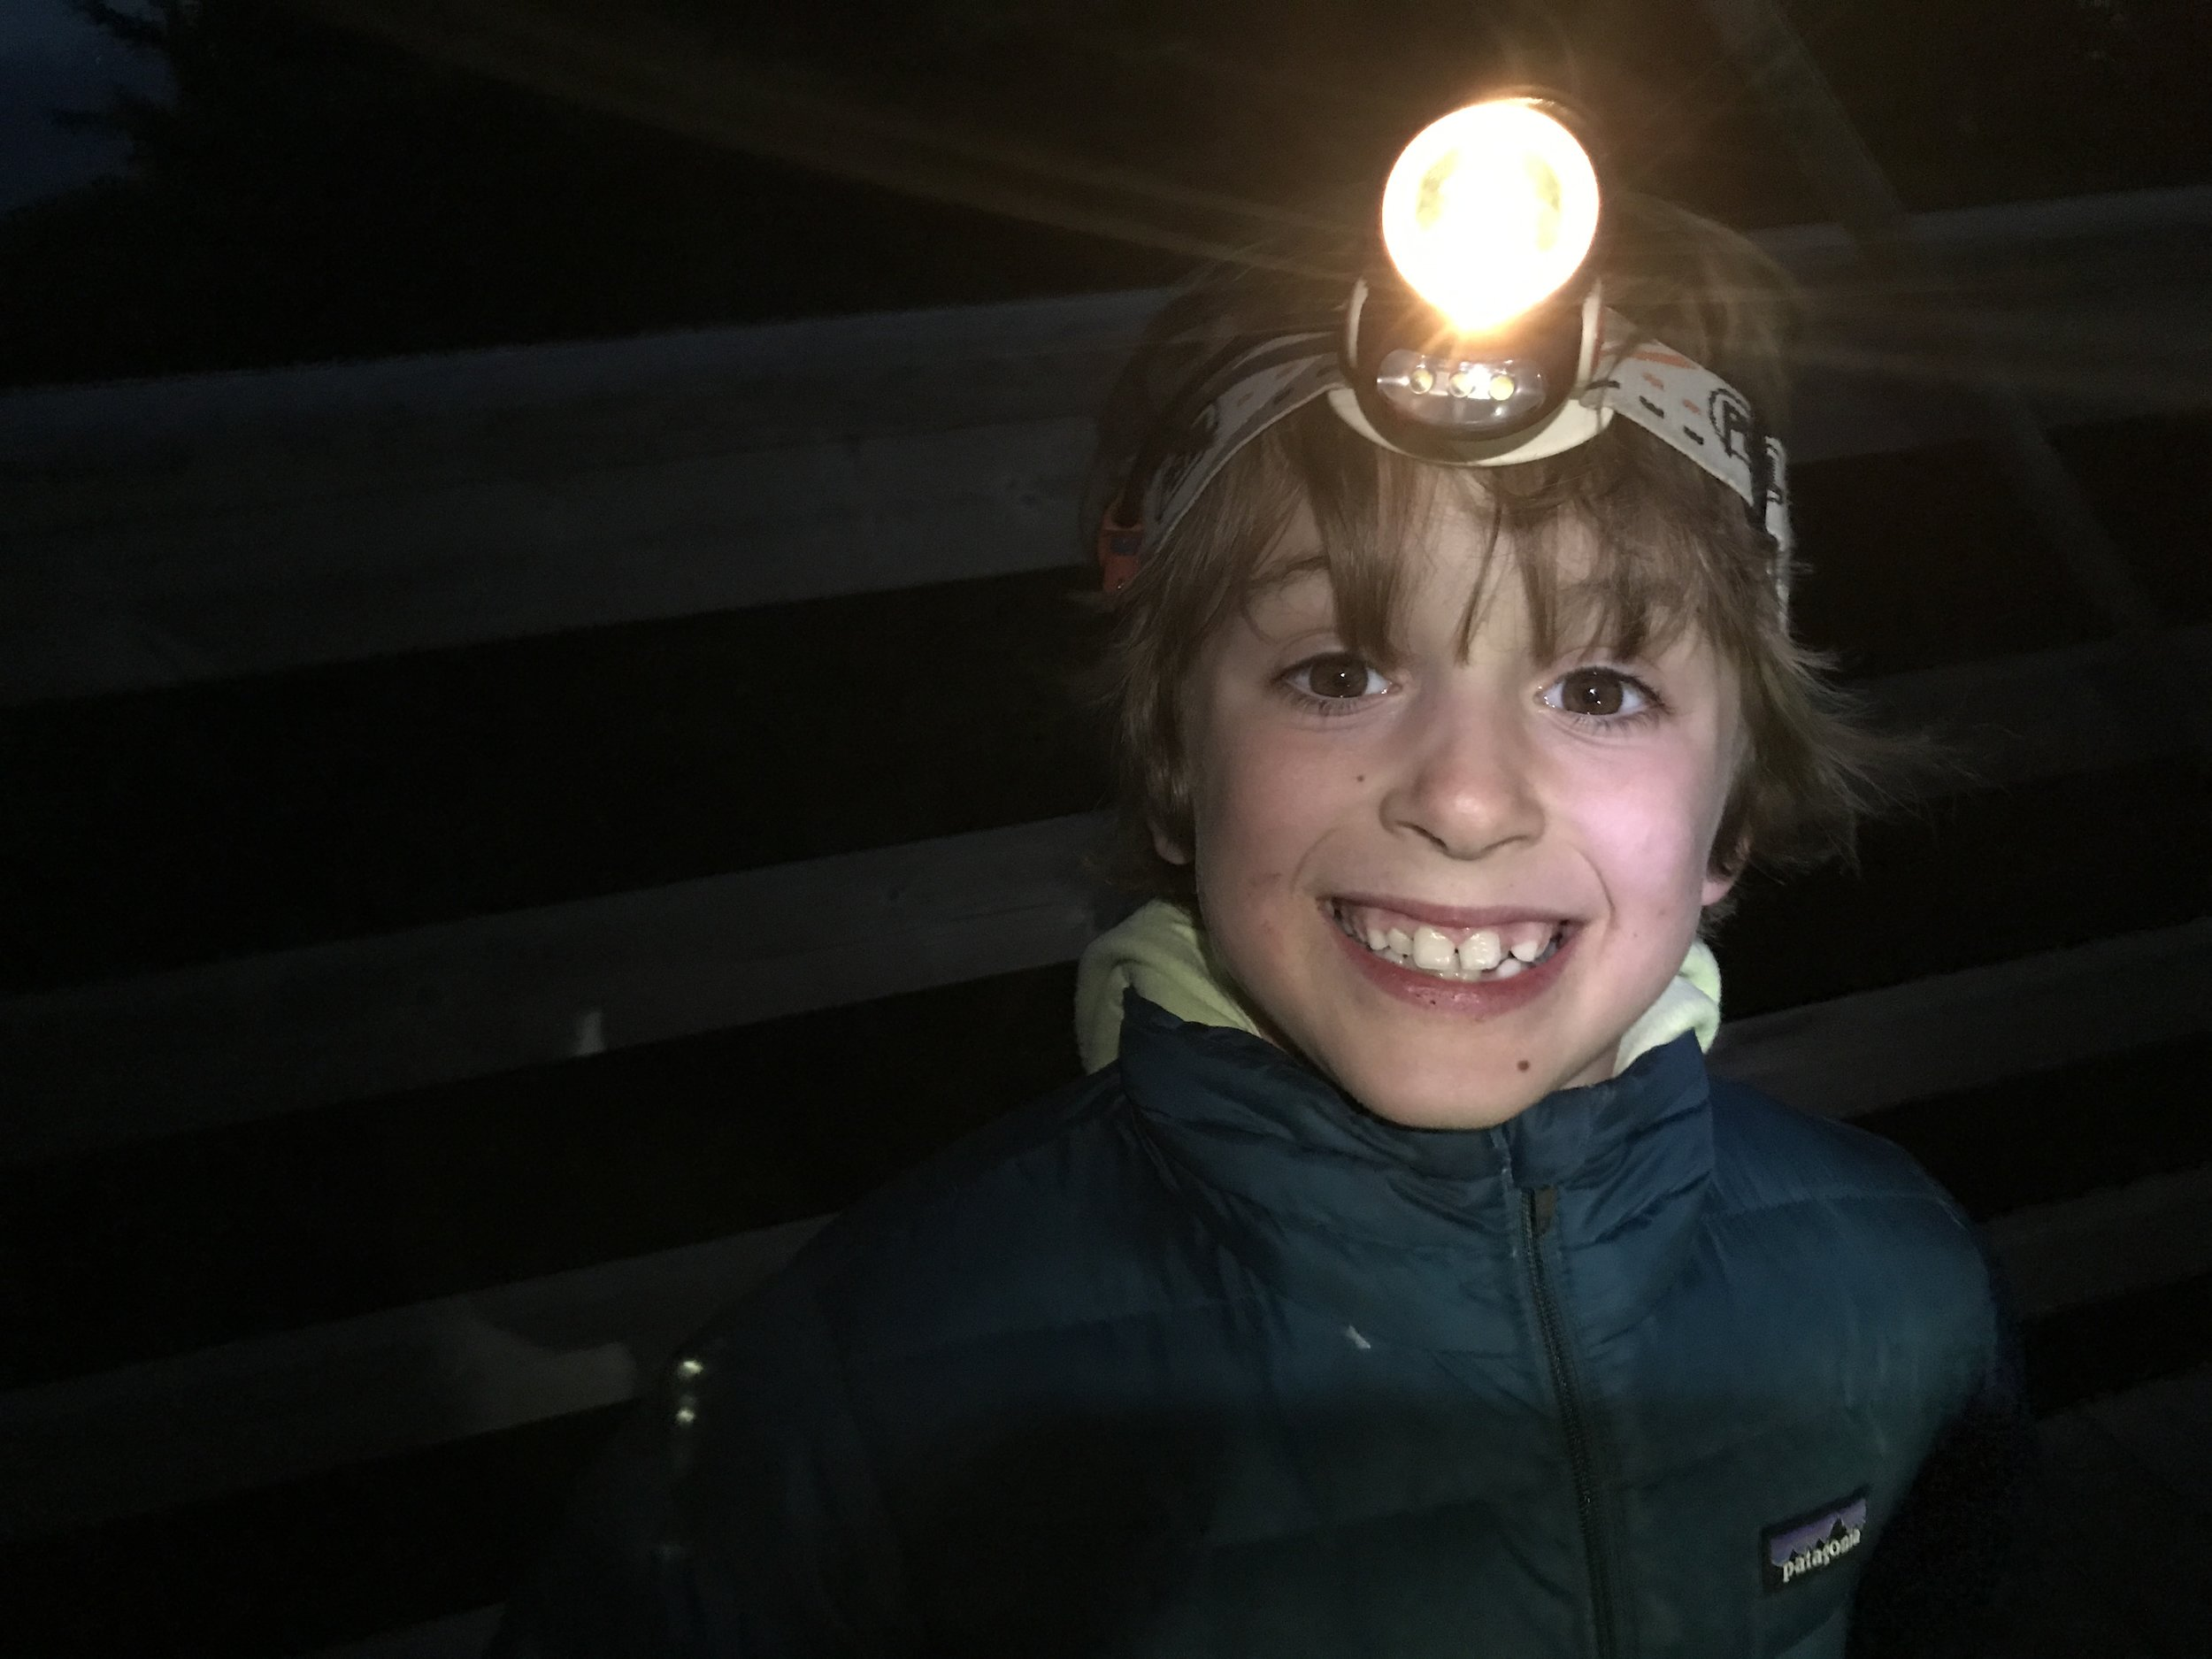 Ben is loving the idea of hiking in the dark...bring on nightfall!